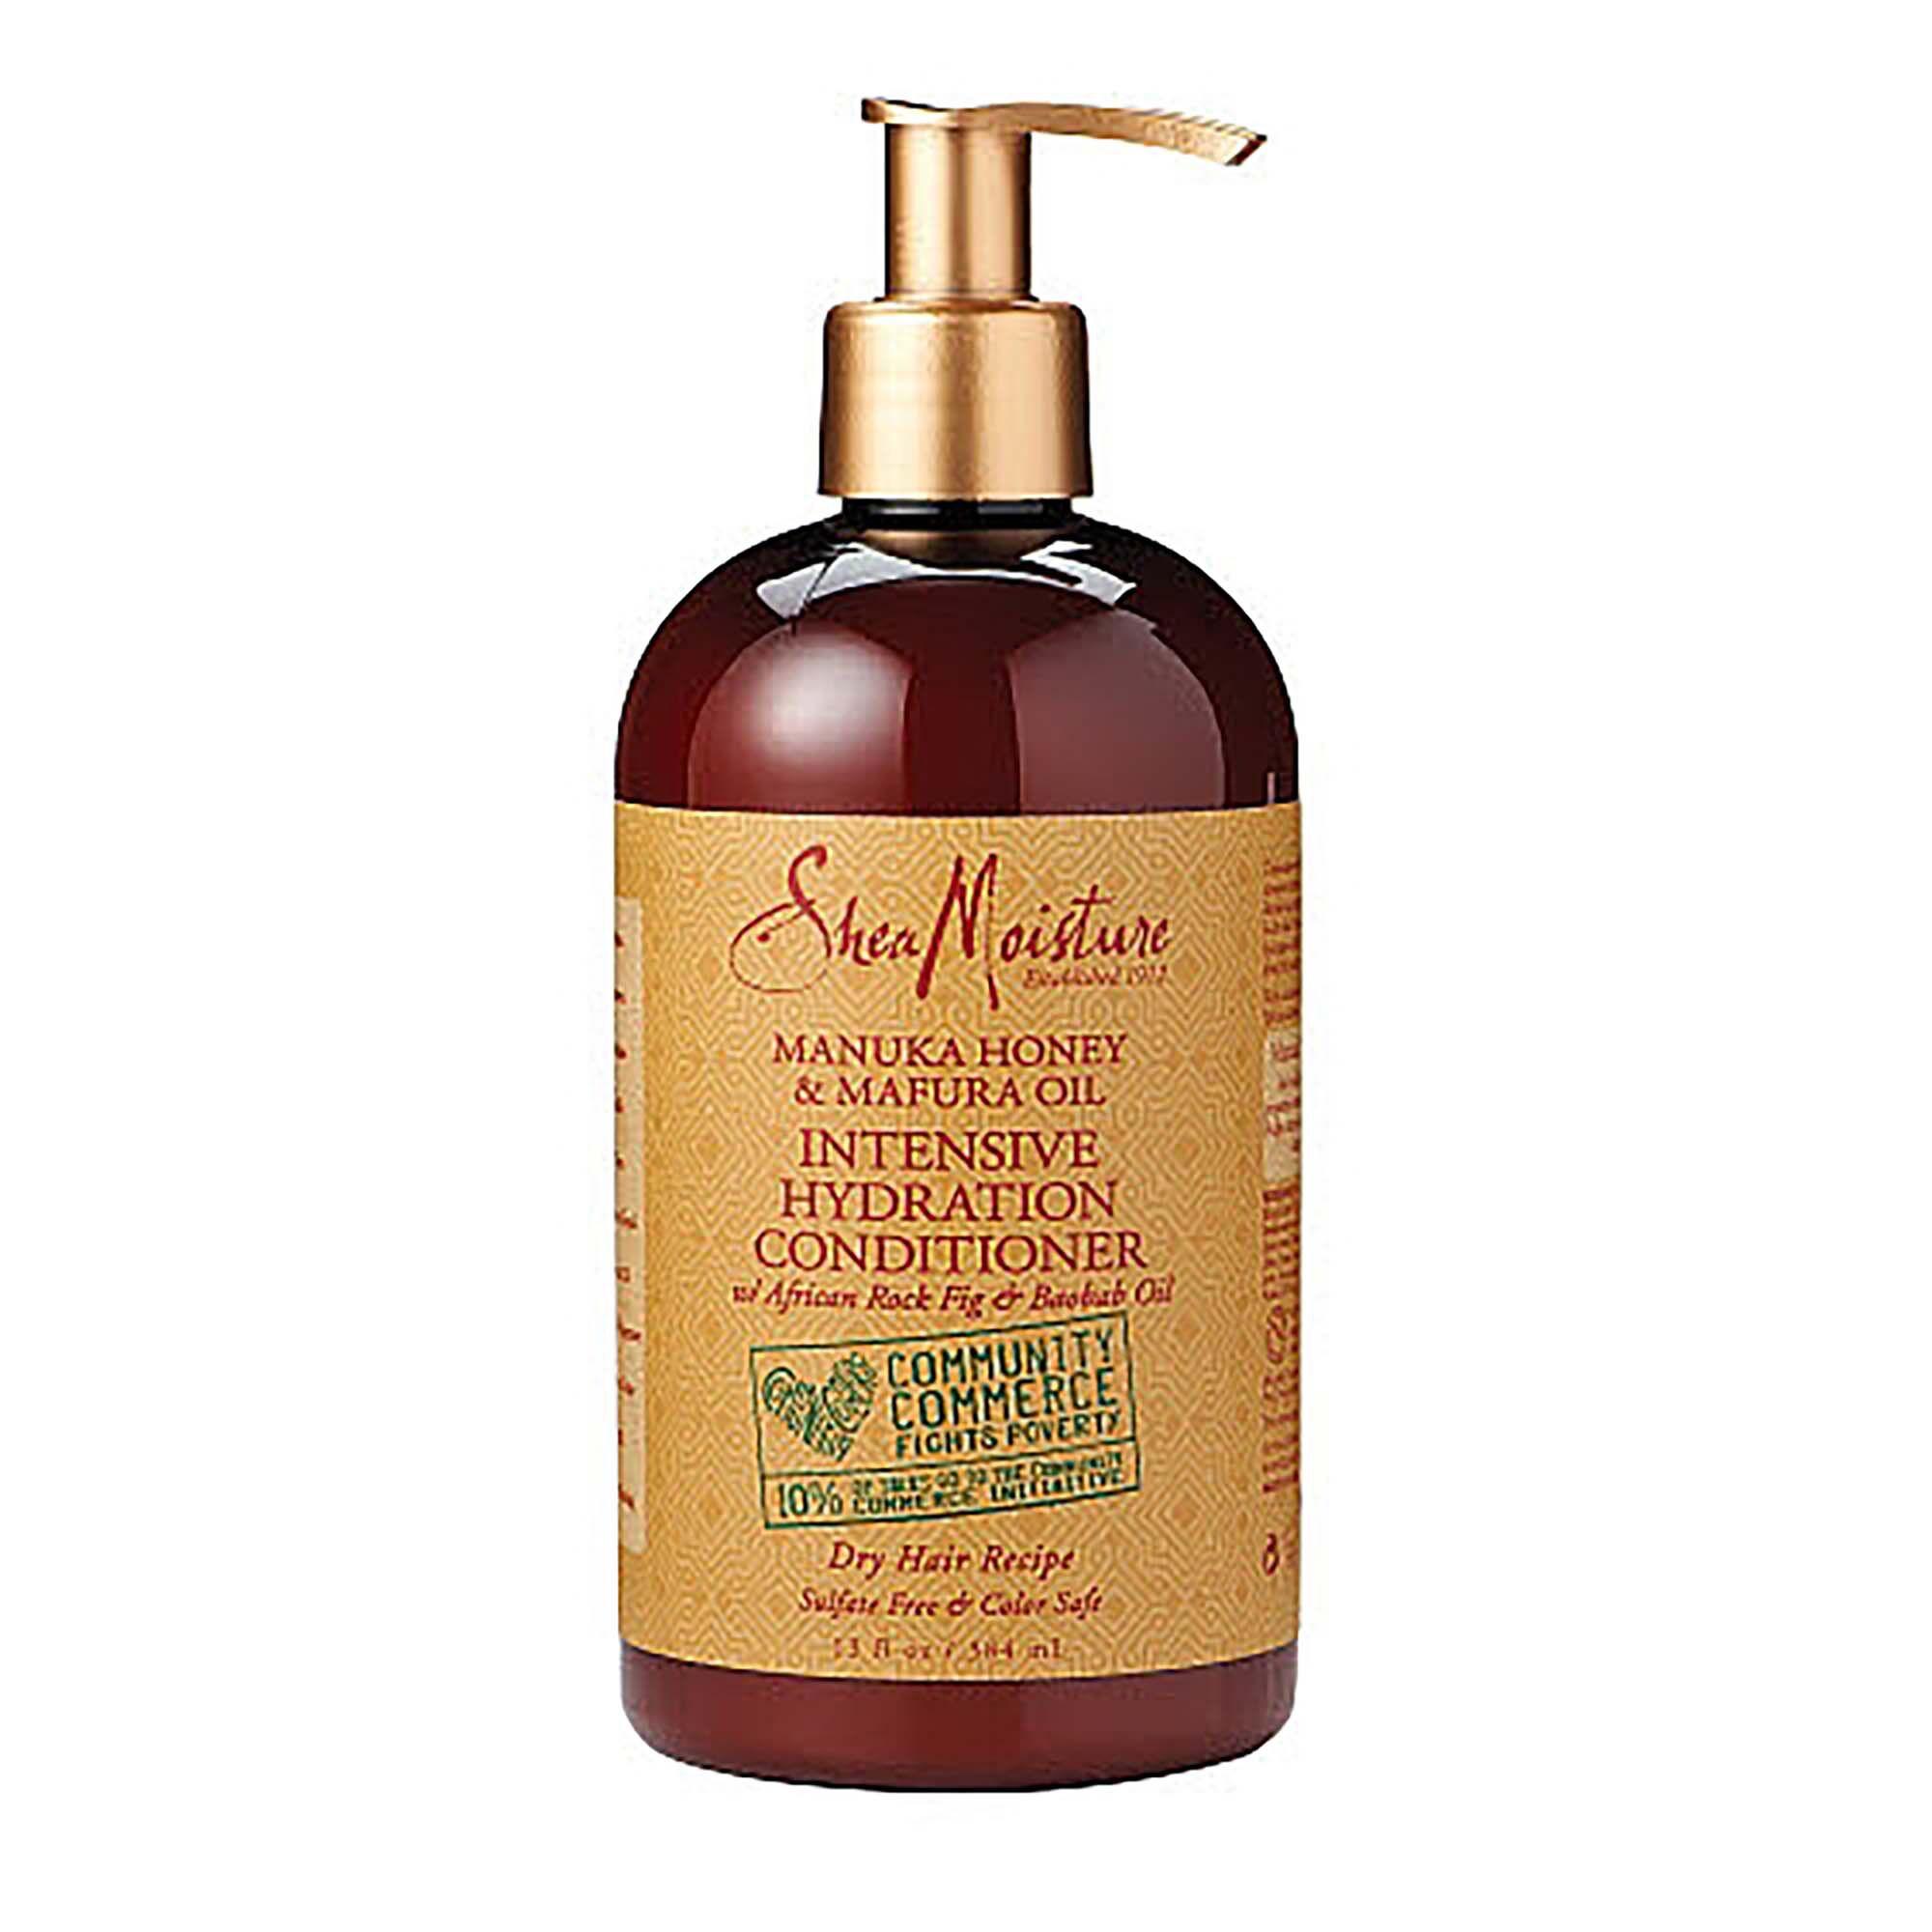 Manuka Honey & Mafura Oil Intensive Hydration Conditioner 13 Fl. Oz. Shea Moisture Shampoo & Conditioner